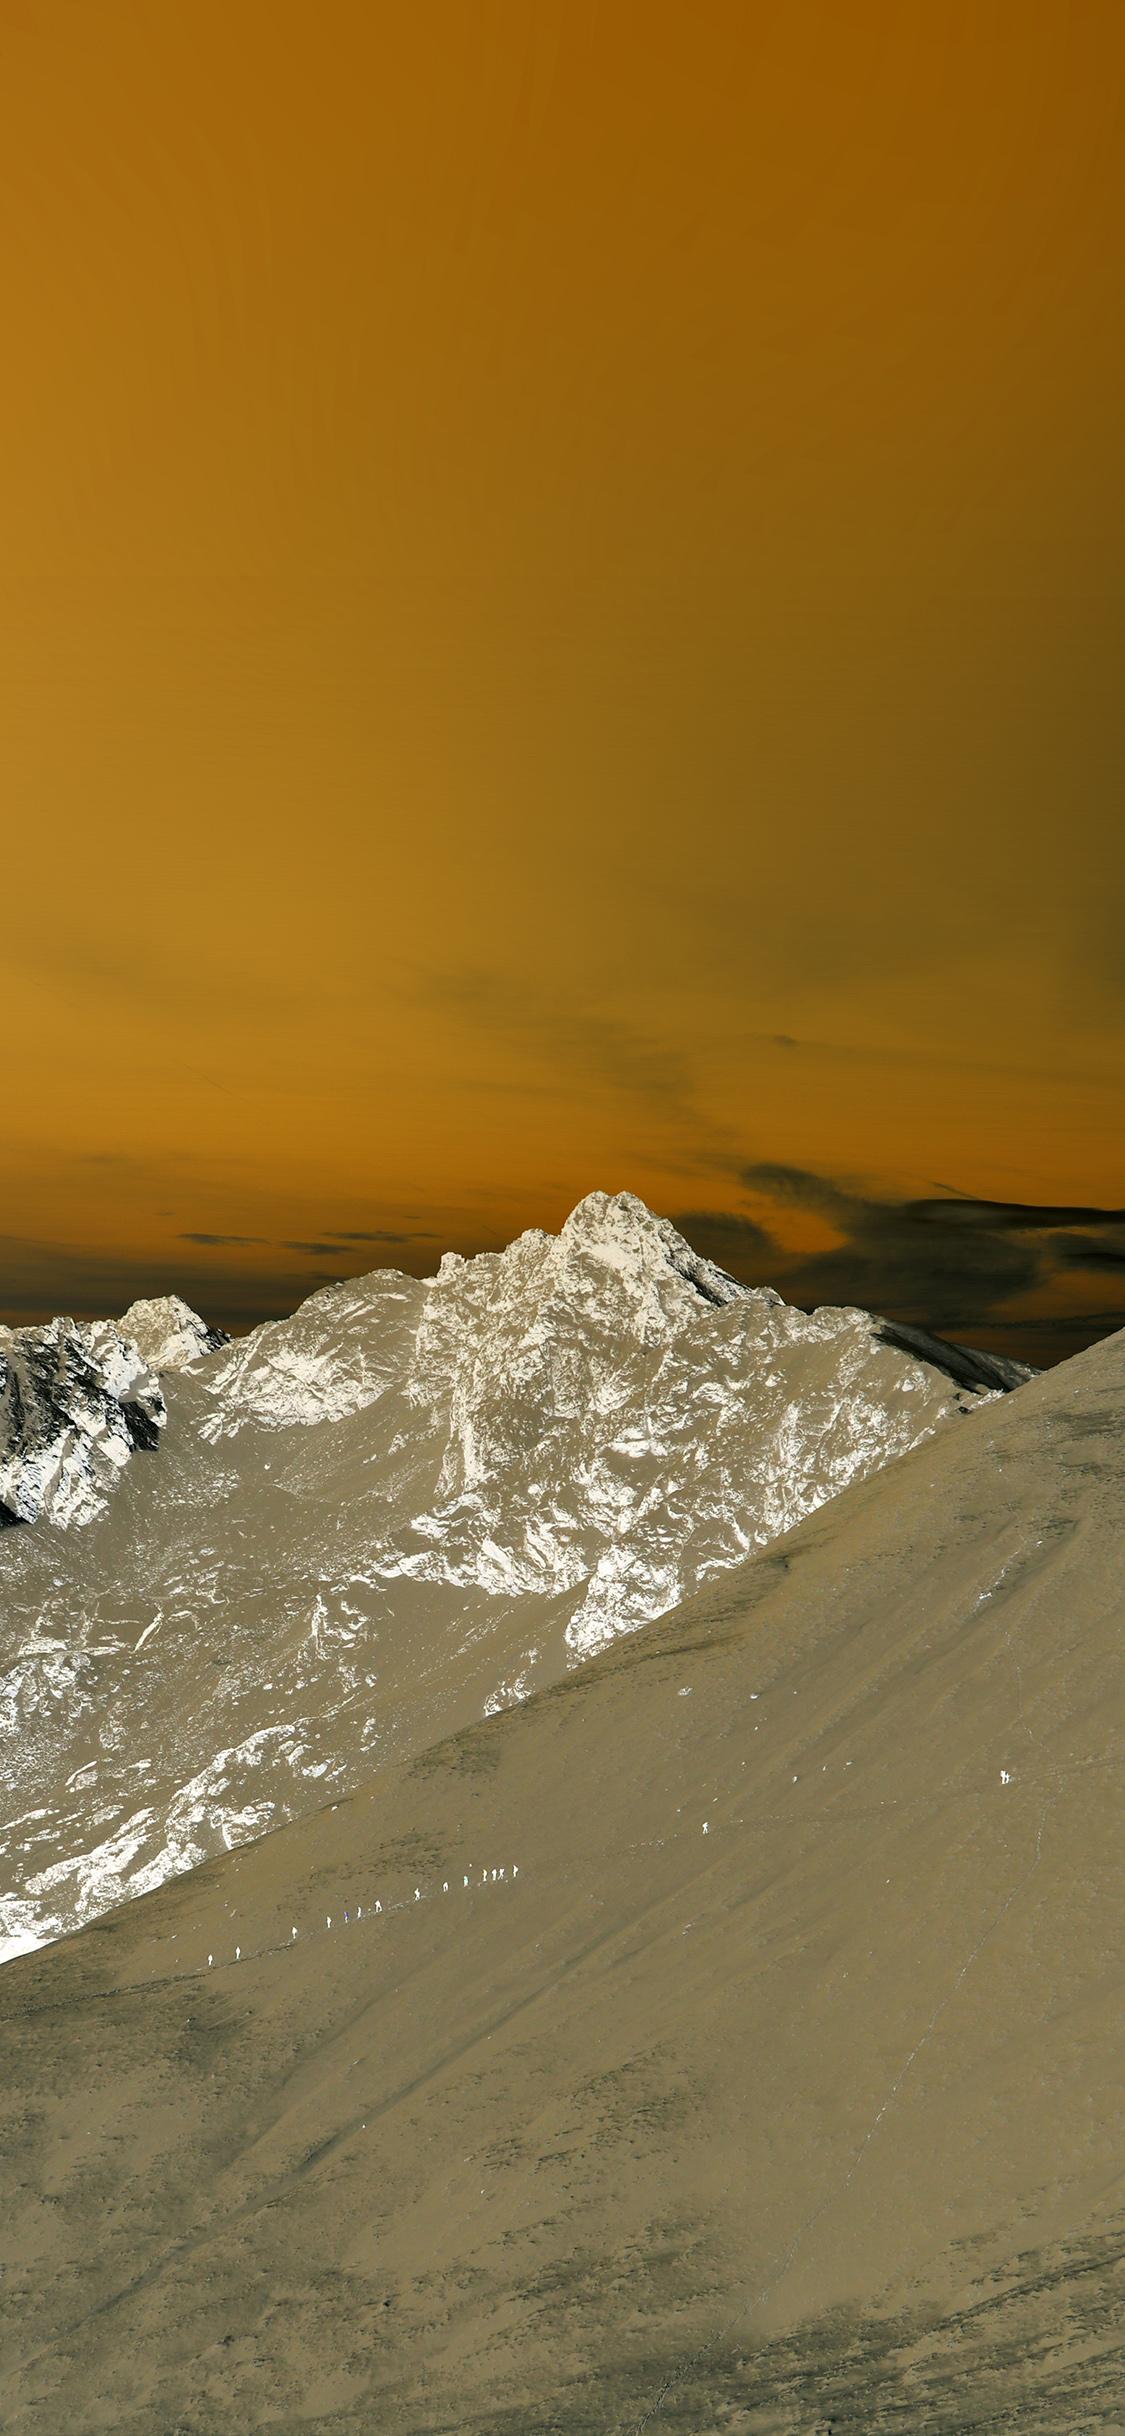 iPhonexpapers.com-Apple-iPhone-wallpaper-mx98-winter-mountain-snow-gold-nature-orange-dark